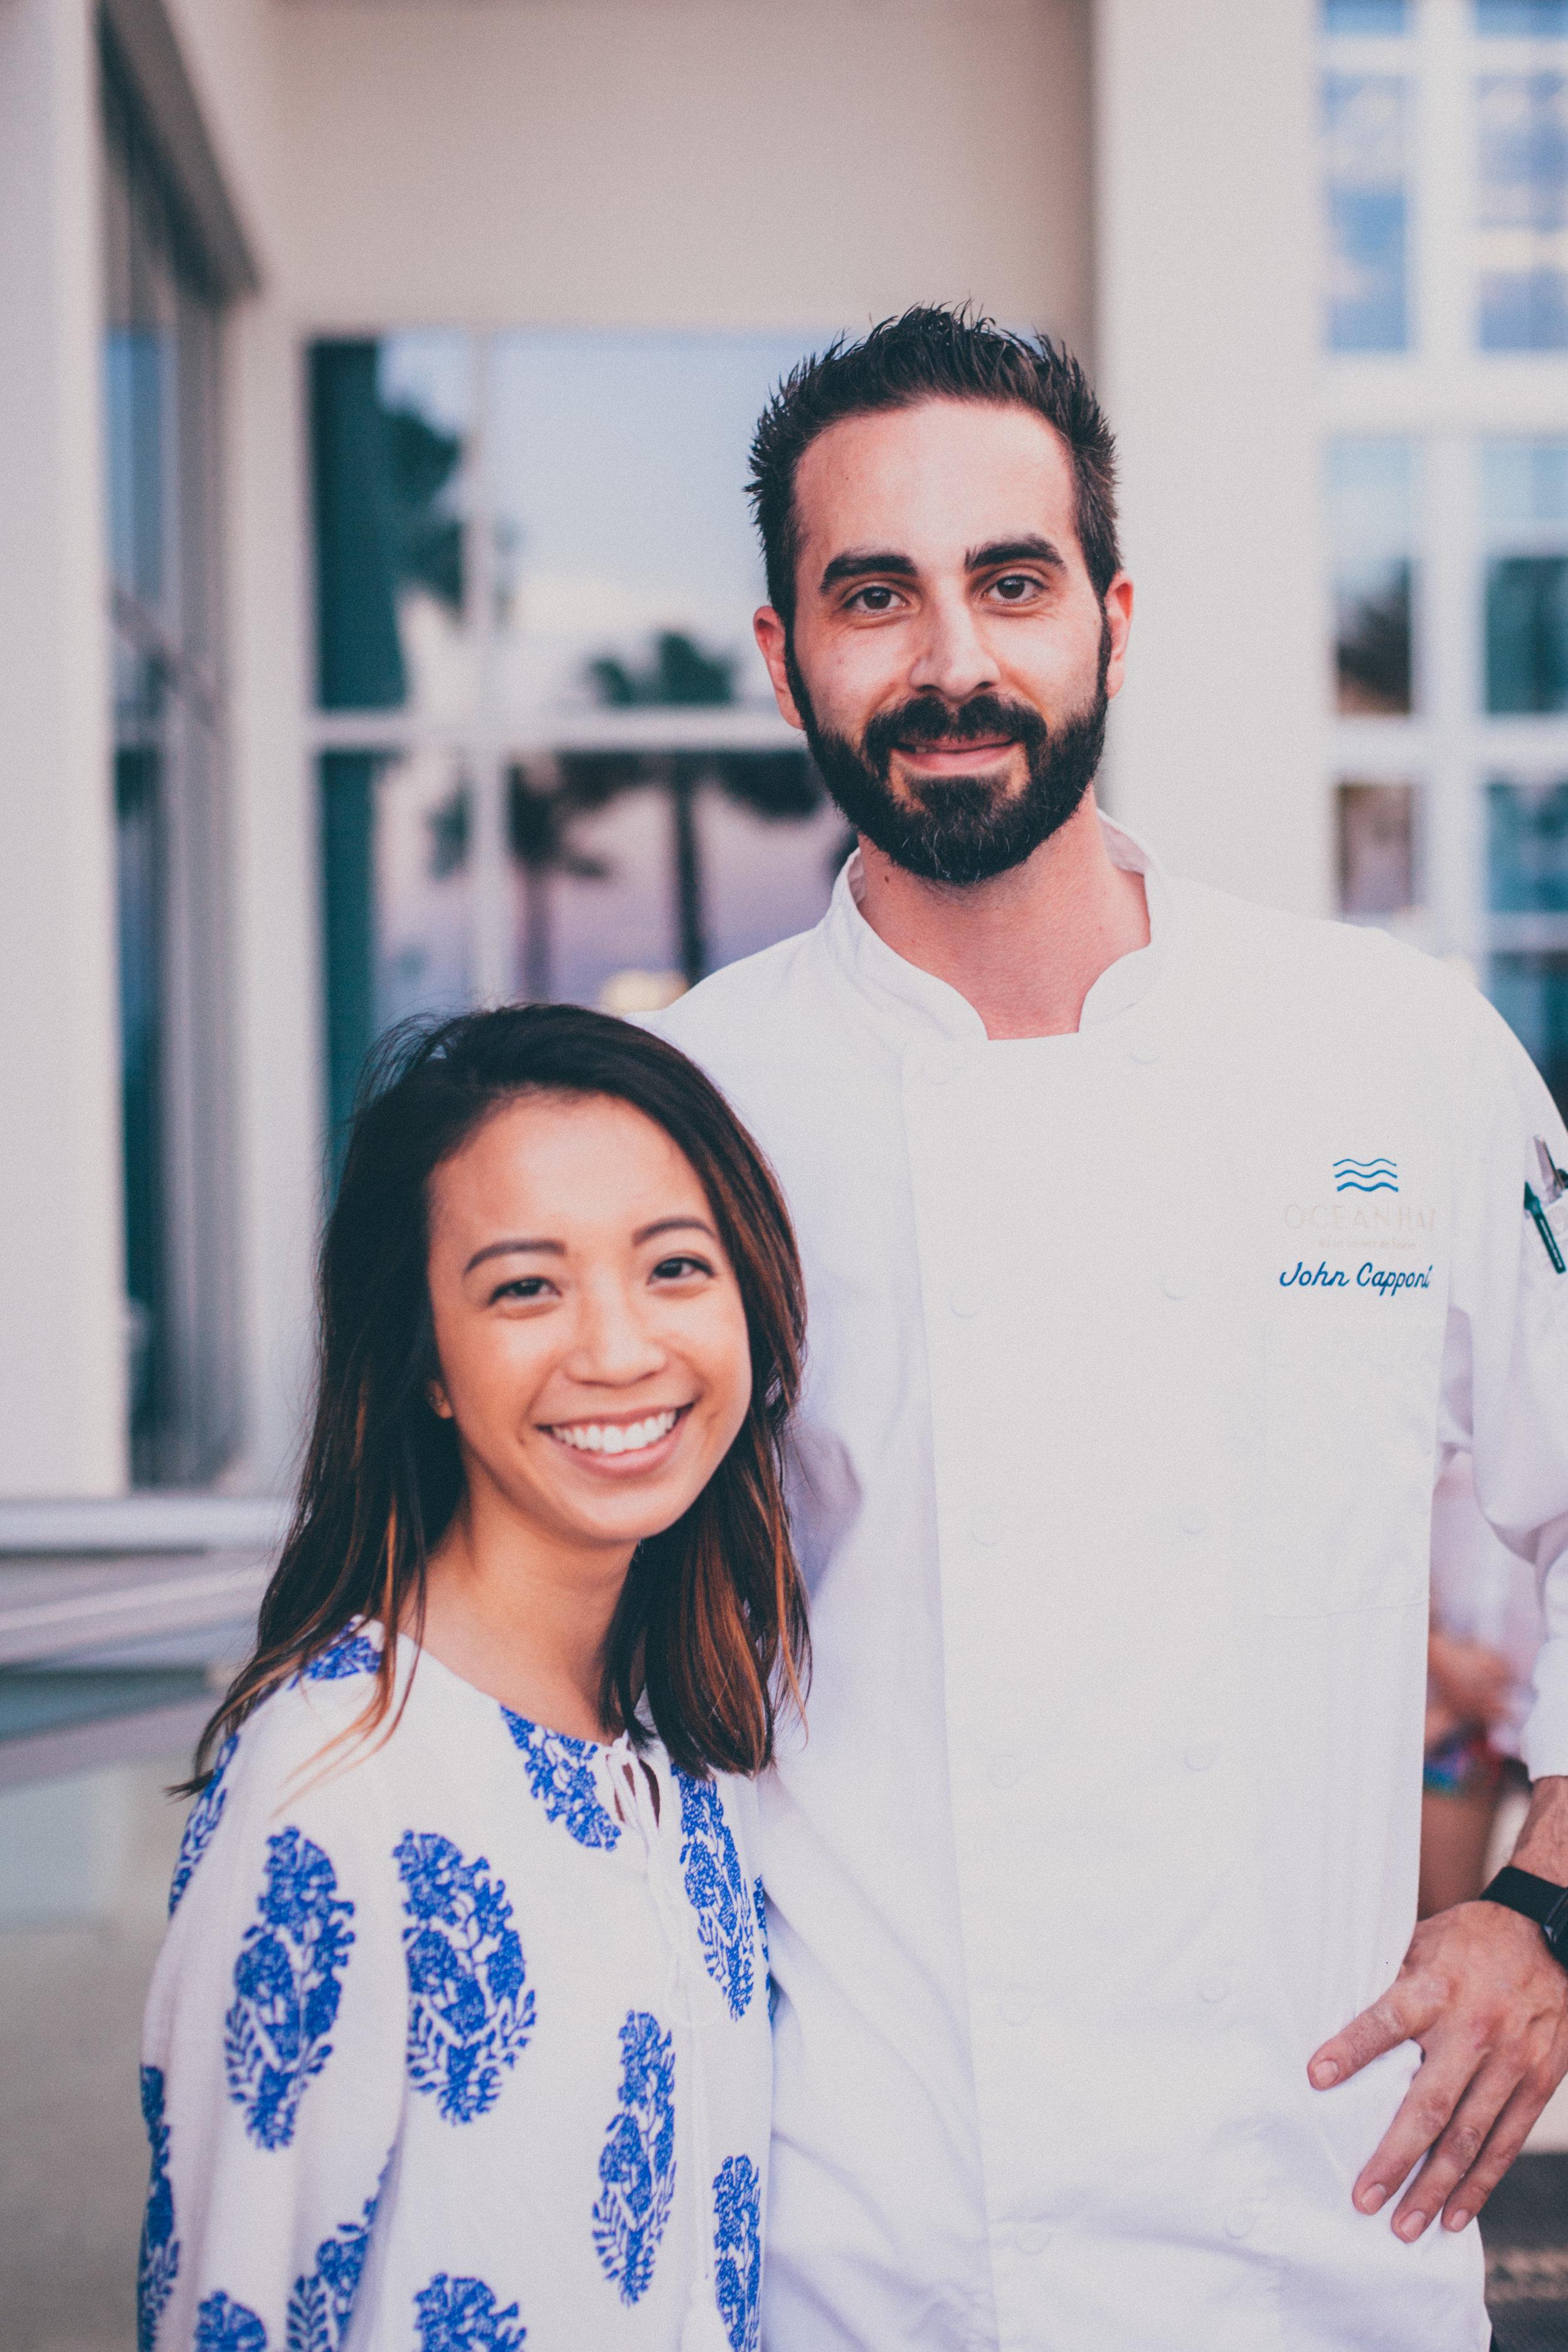 Chef de Cuisine of Ocean Hai,  Chef John Capponi